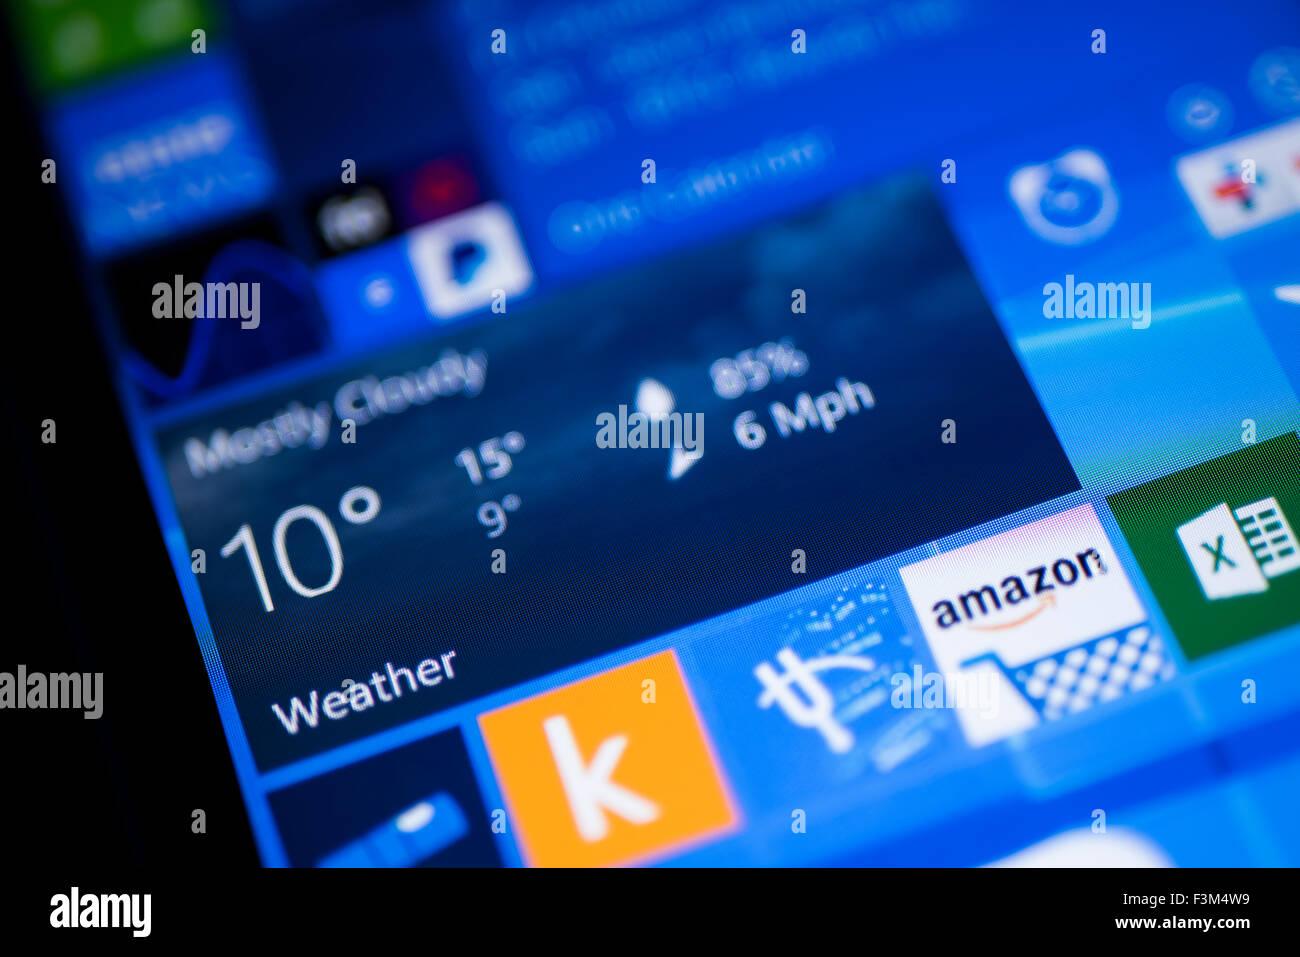 Windows 10 Phone Stock Photos & Windows 10 Phone Stock